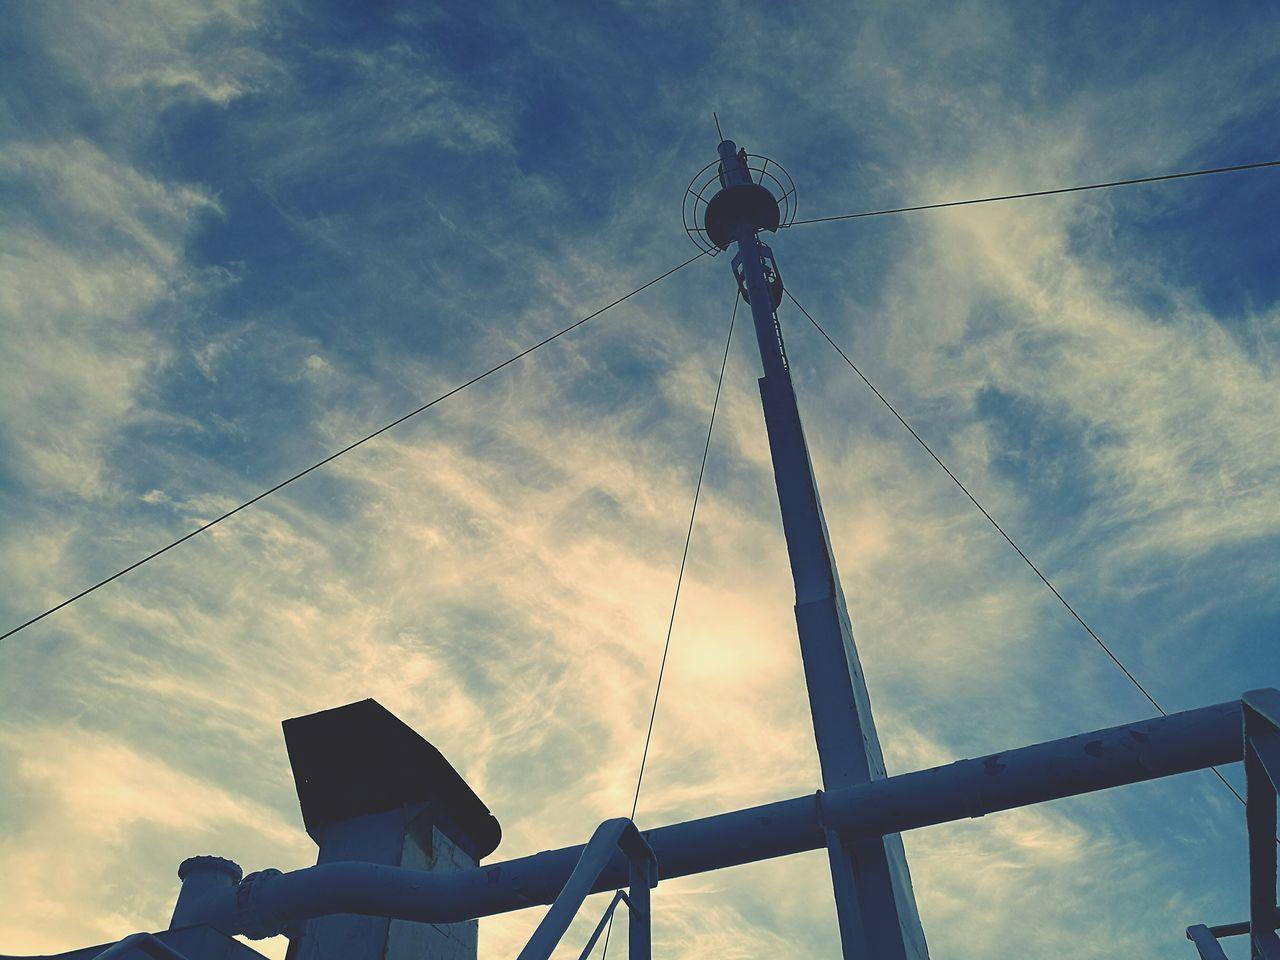 Sky Sky And Clouds Cloud - Sky No People Nature Outdoors Fery